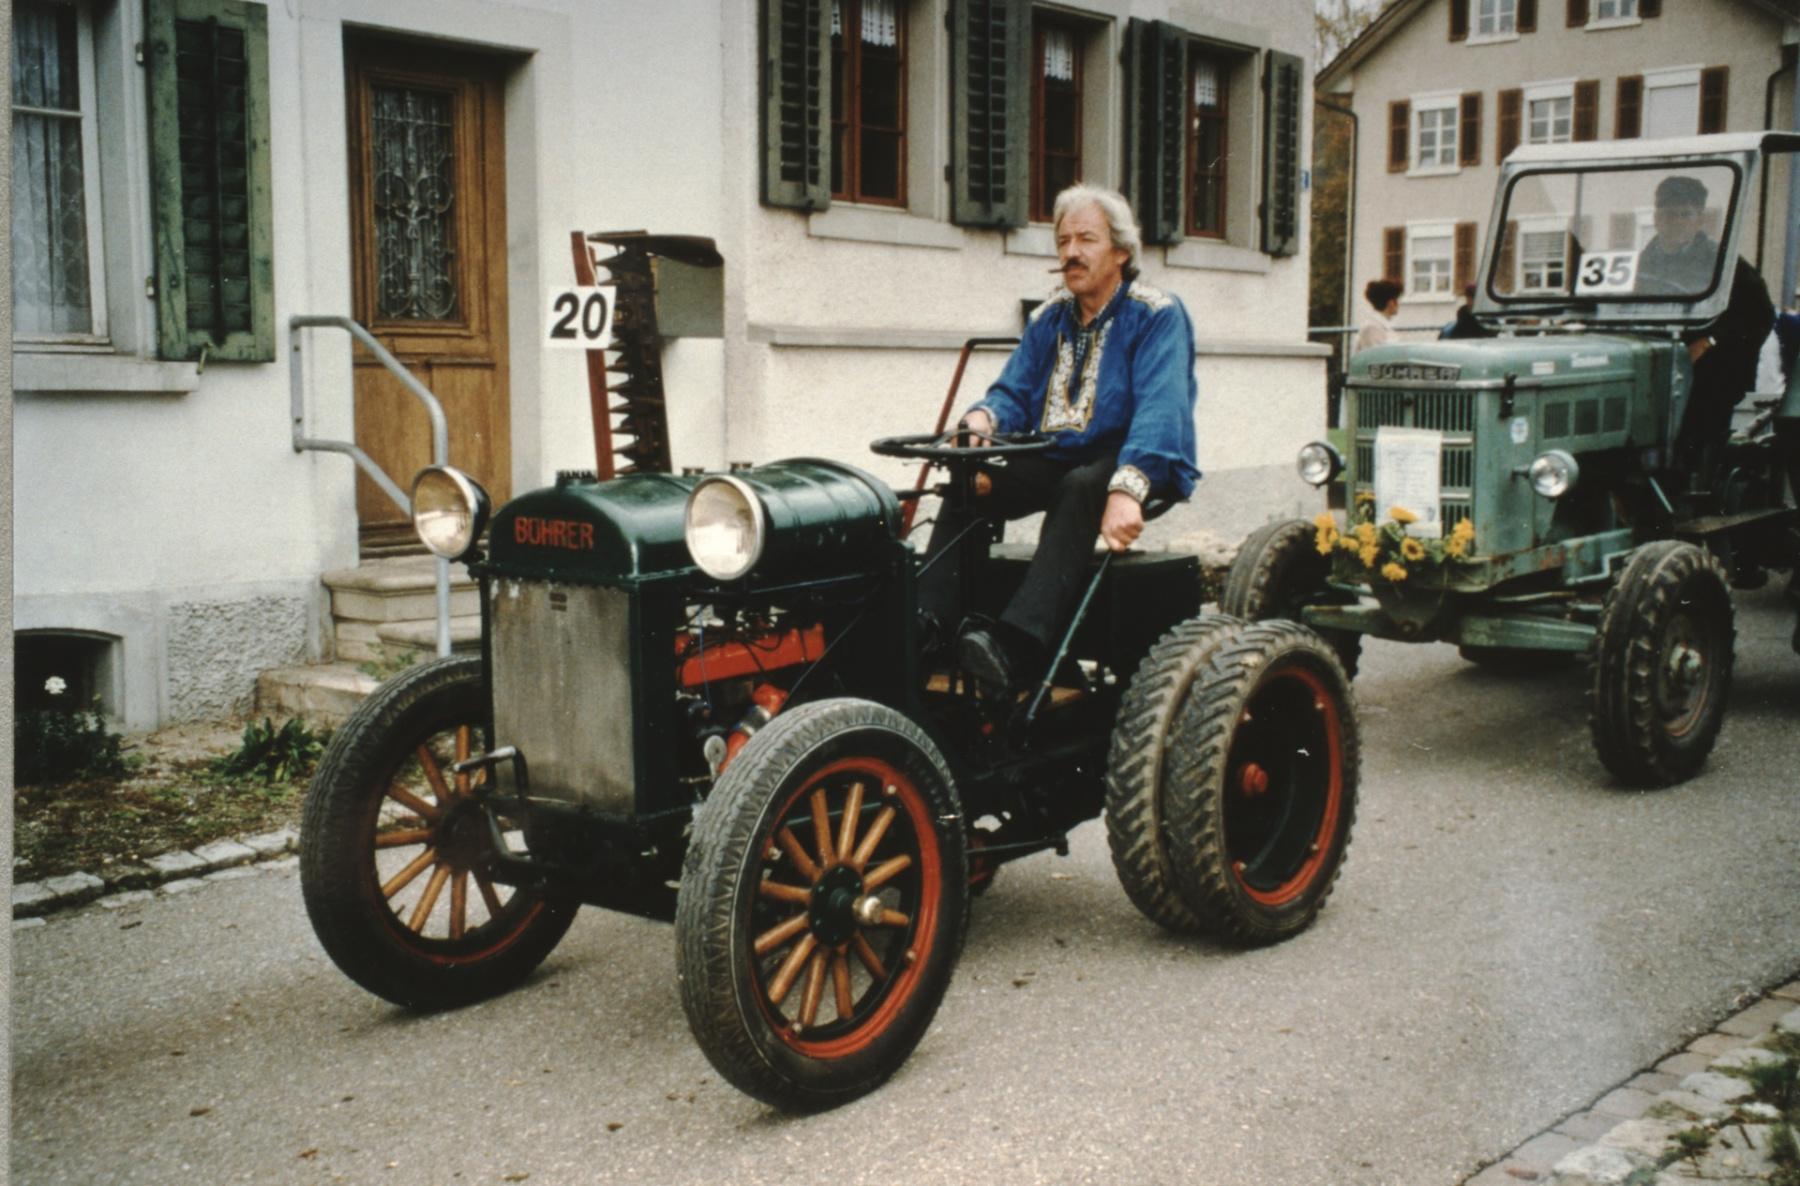 Jubiläumsumzug 100 Jahre Viehzuchtgenossenschaft, Alter Bührer Traktor